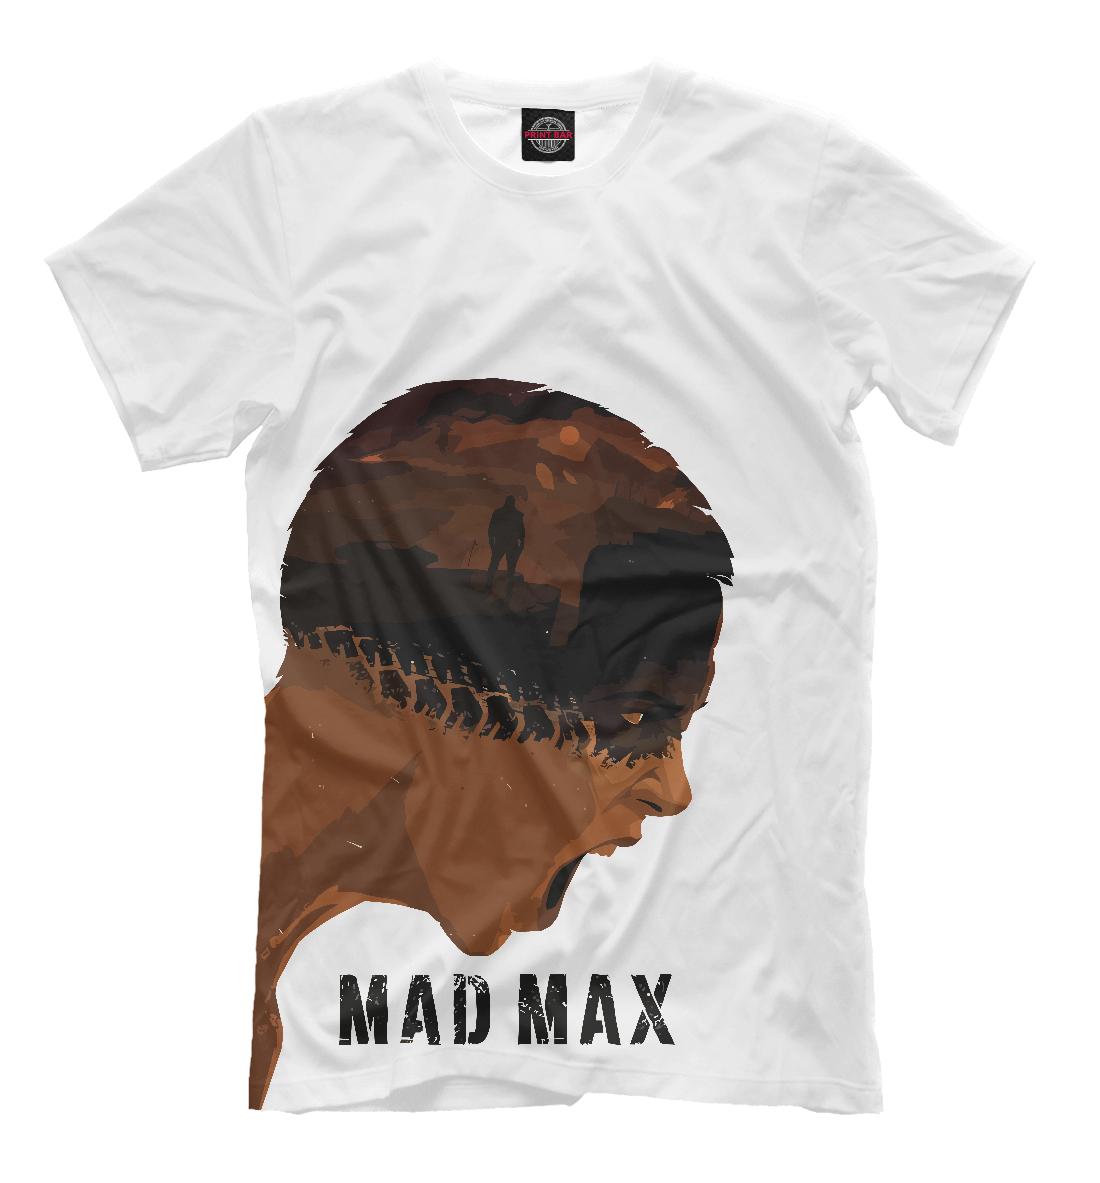 Купить Mad Max, Printbar, Футболки, KNO-499365-fut-2